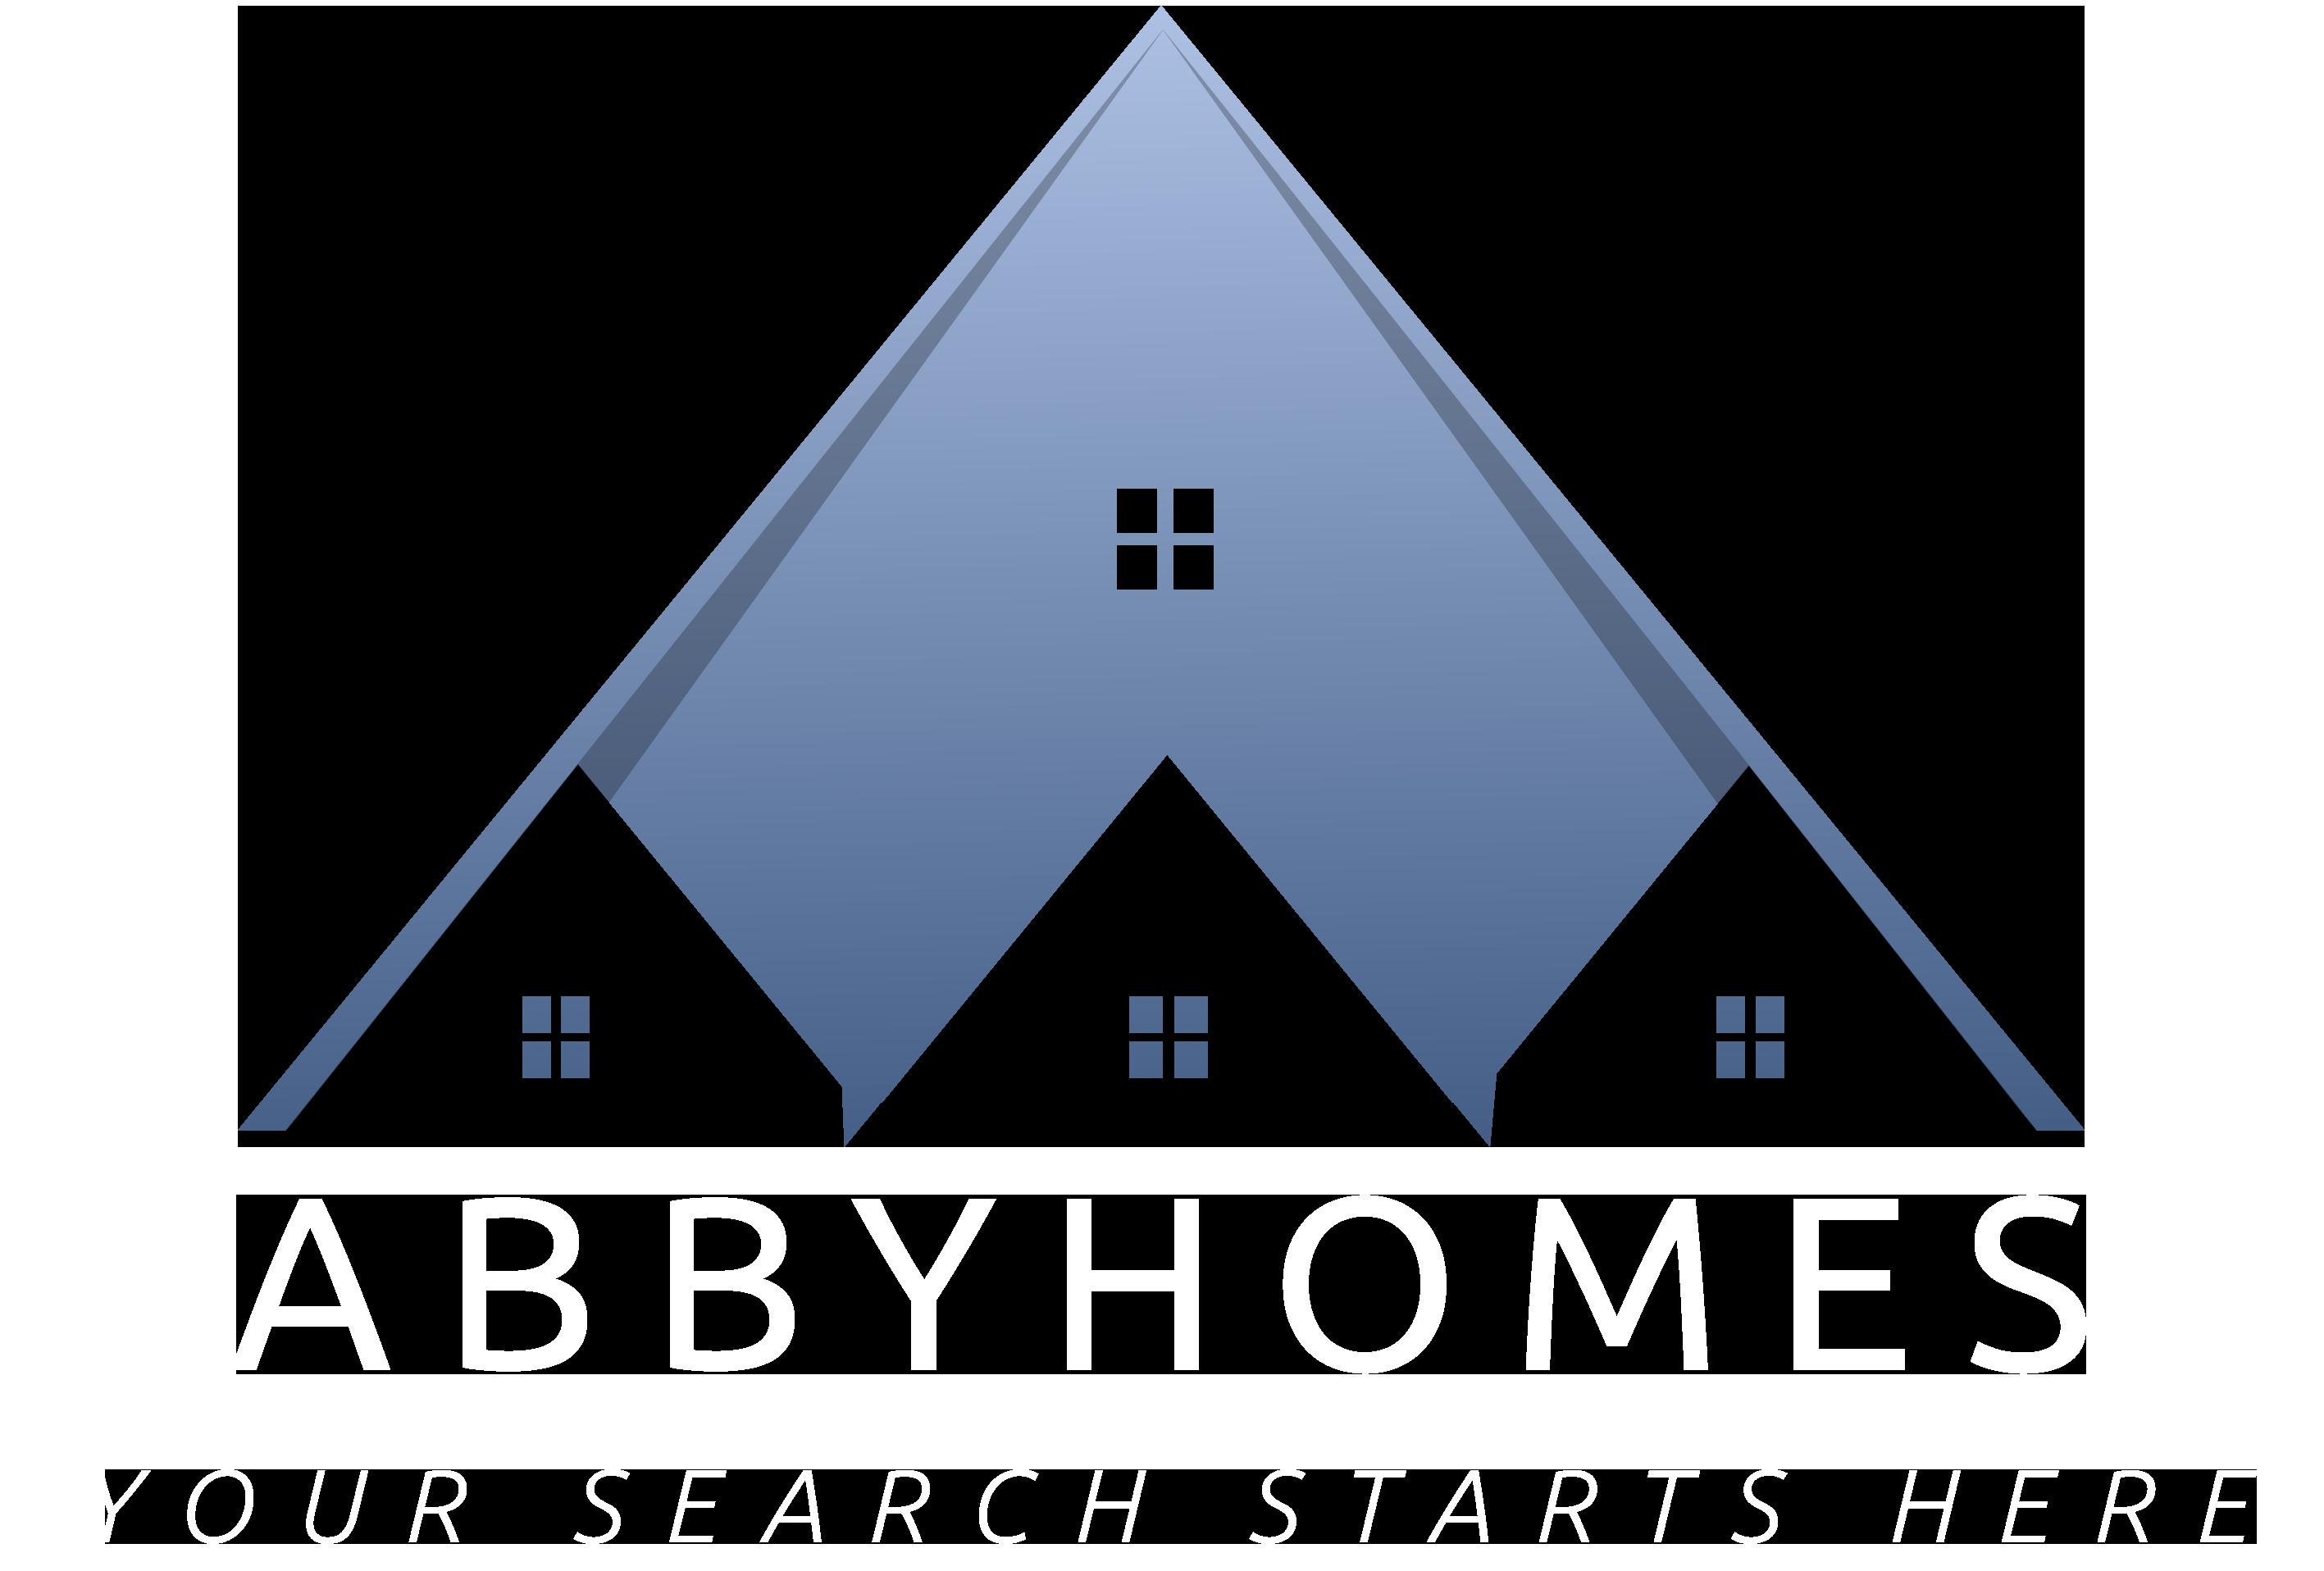 Abbyhomesforsale - Kelvin Behrens